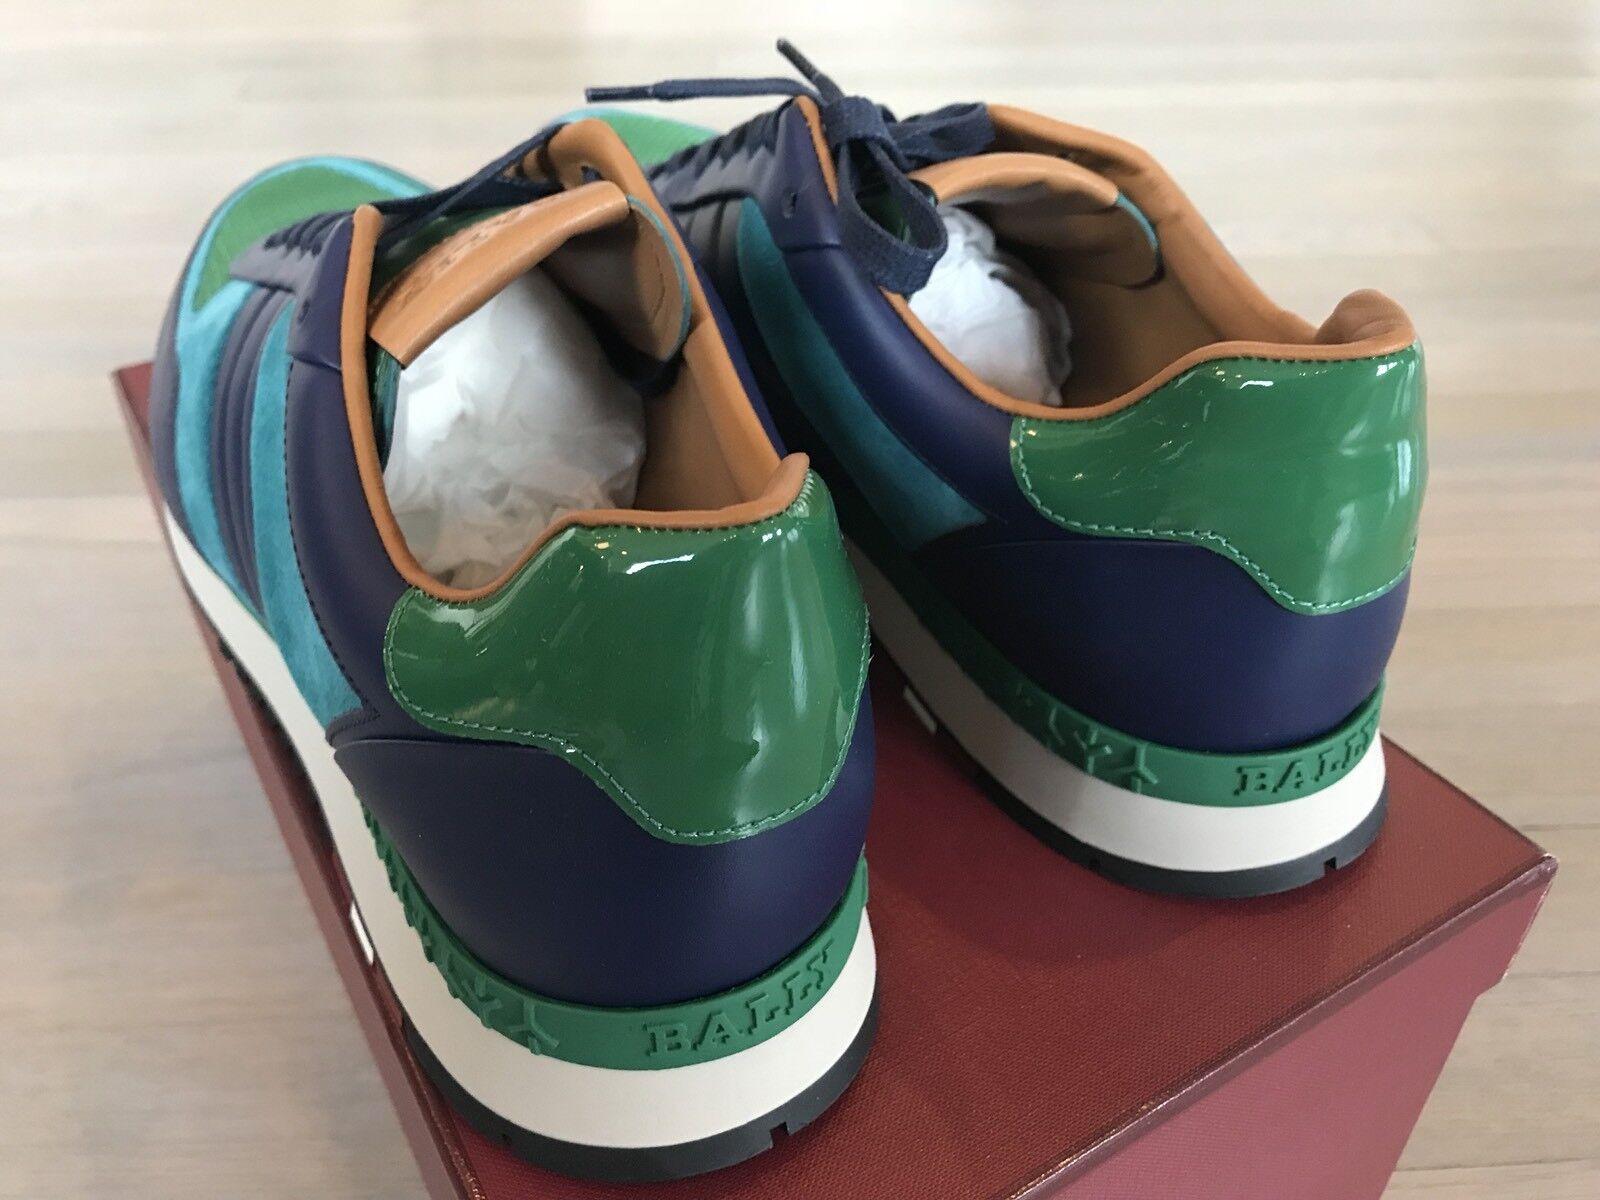 Scarpe casual da uomo  700$ Bally Ascar Grass Leather Sneakers size US 13 Made In Italy